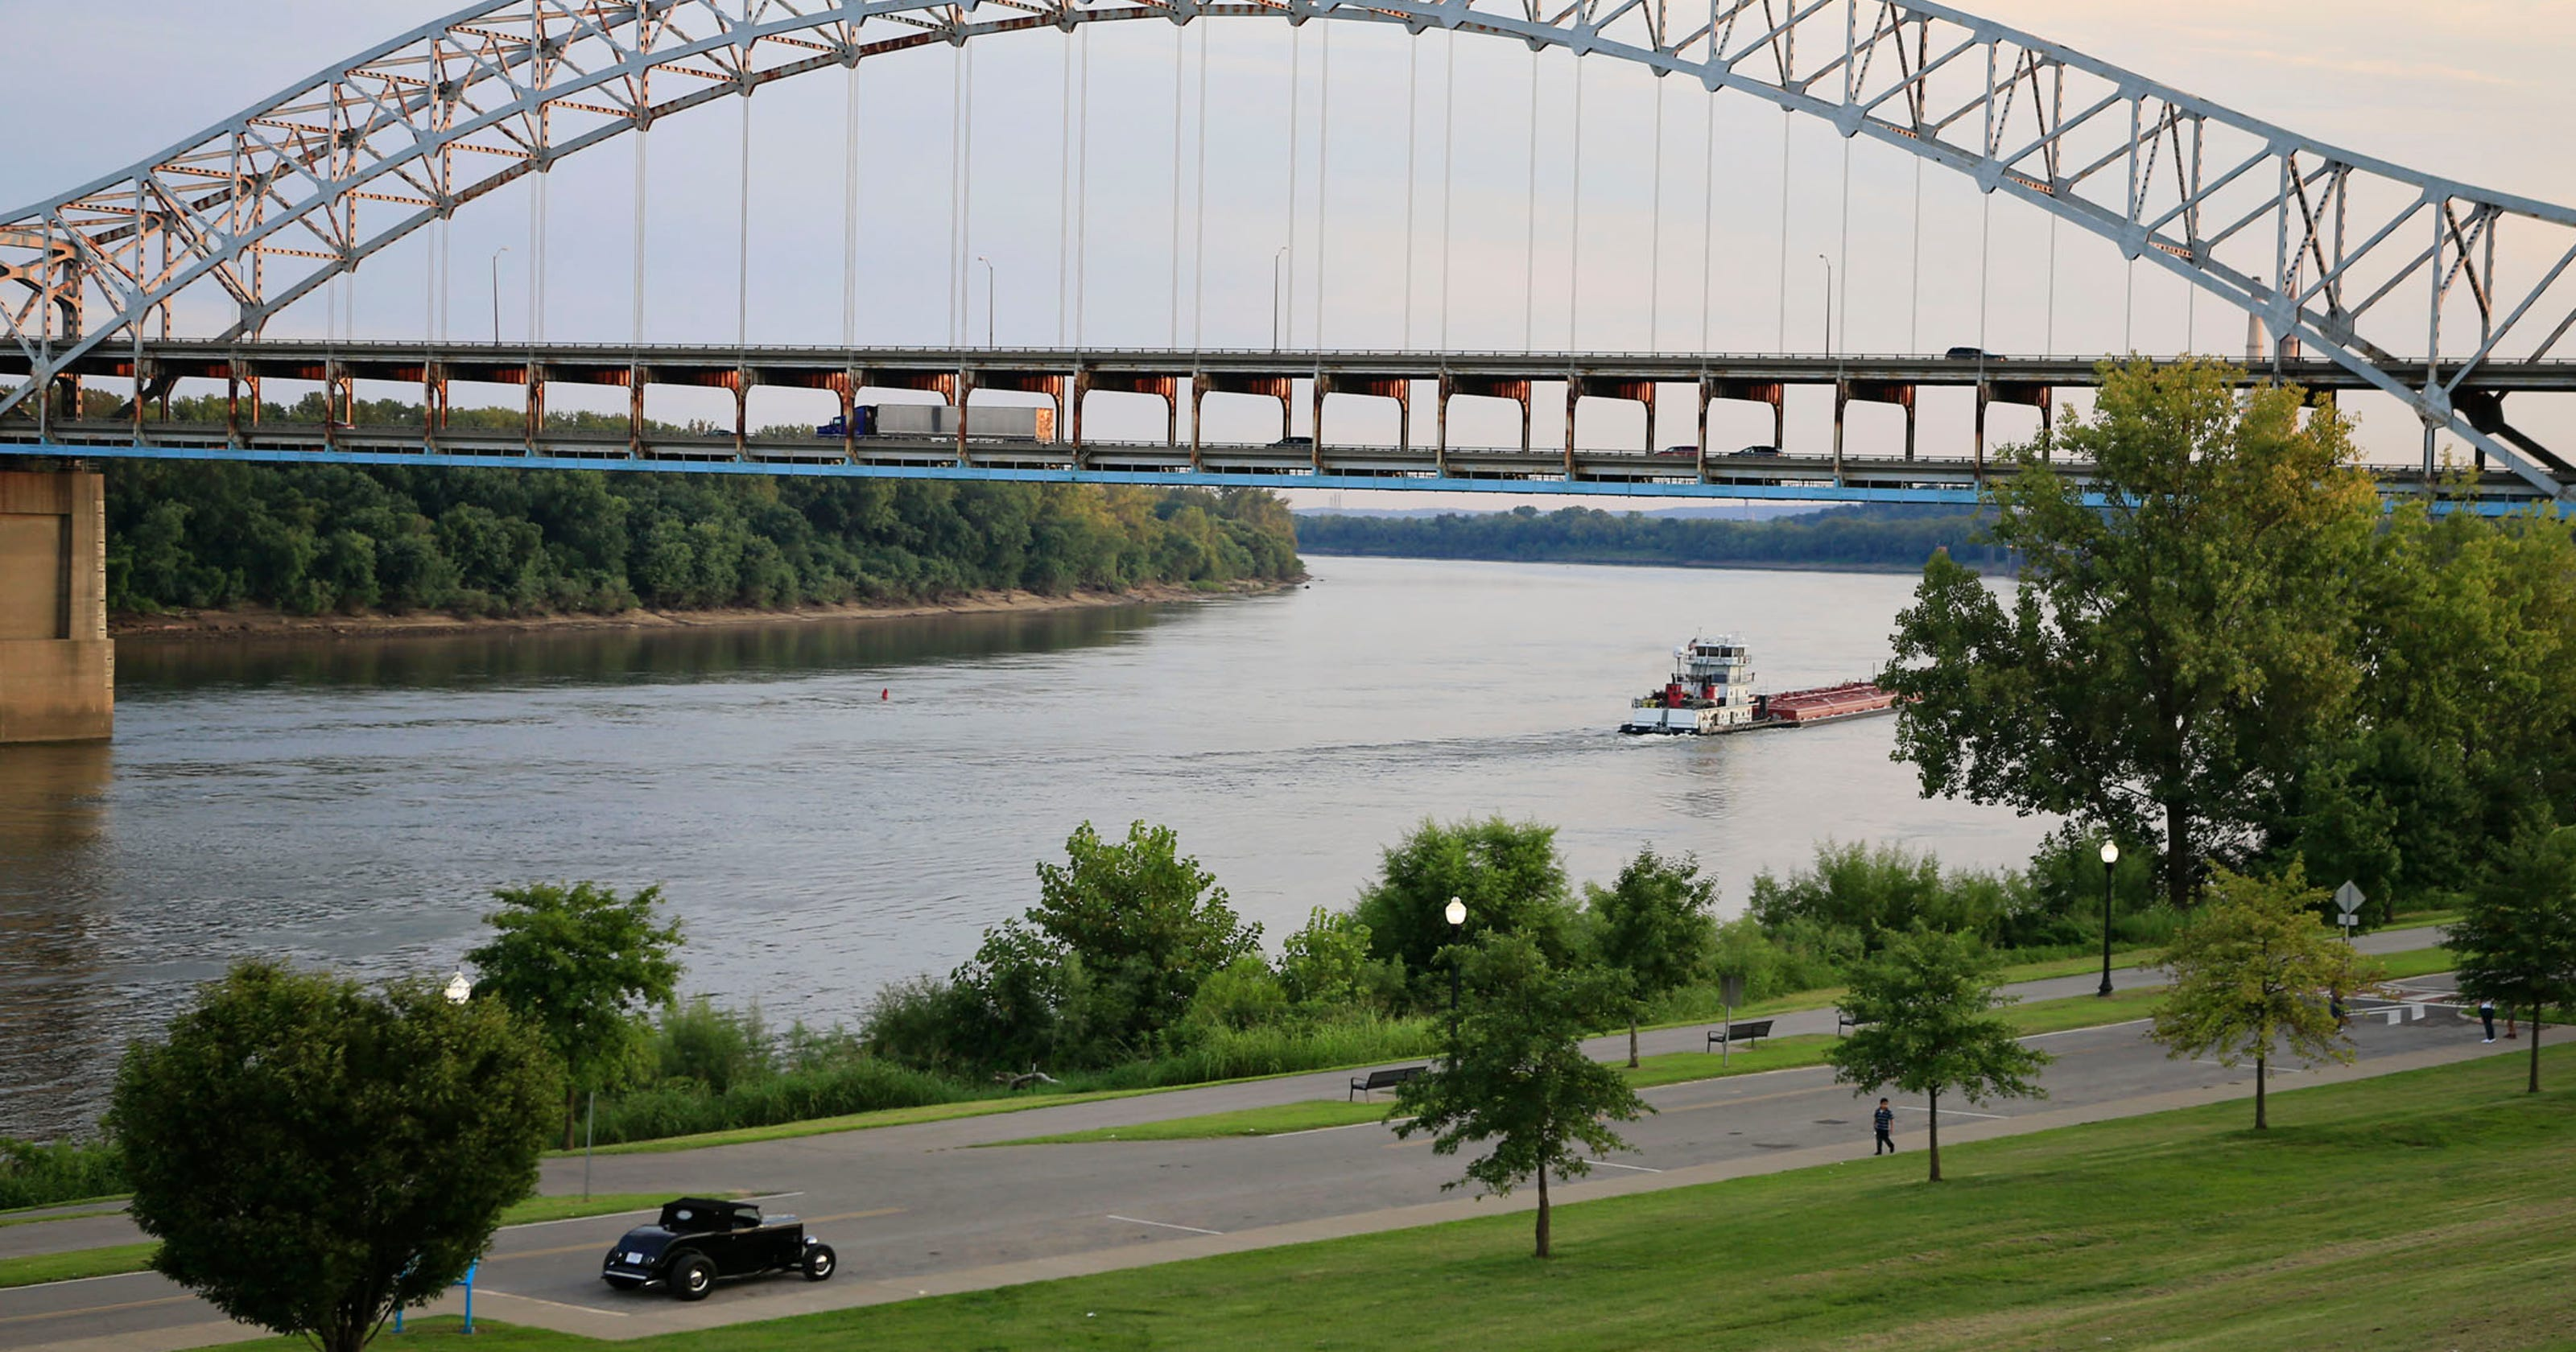 John F Kennedy Bridge Interstate 65 crossing the Ohio River in